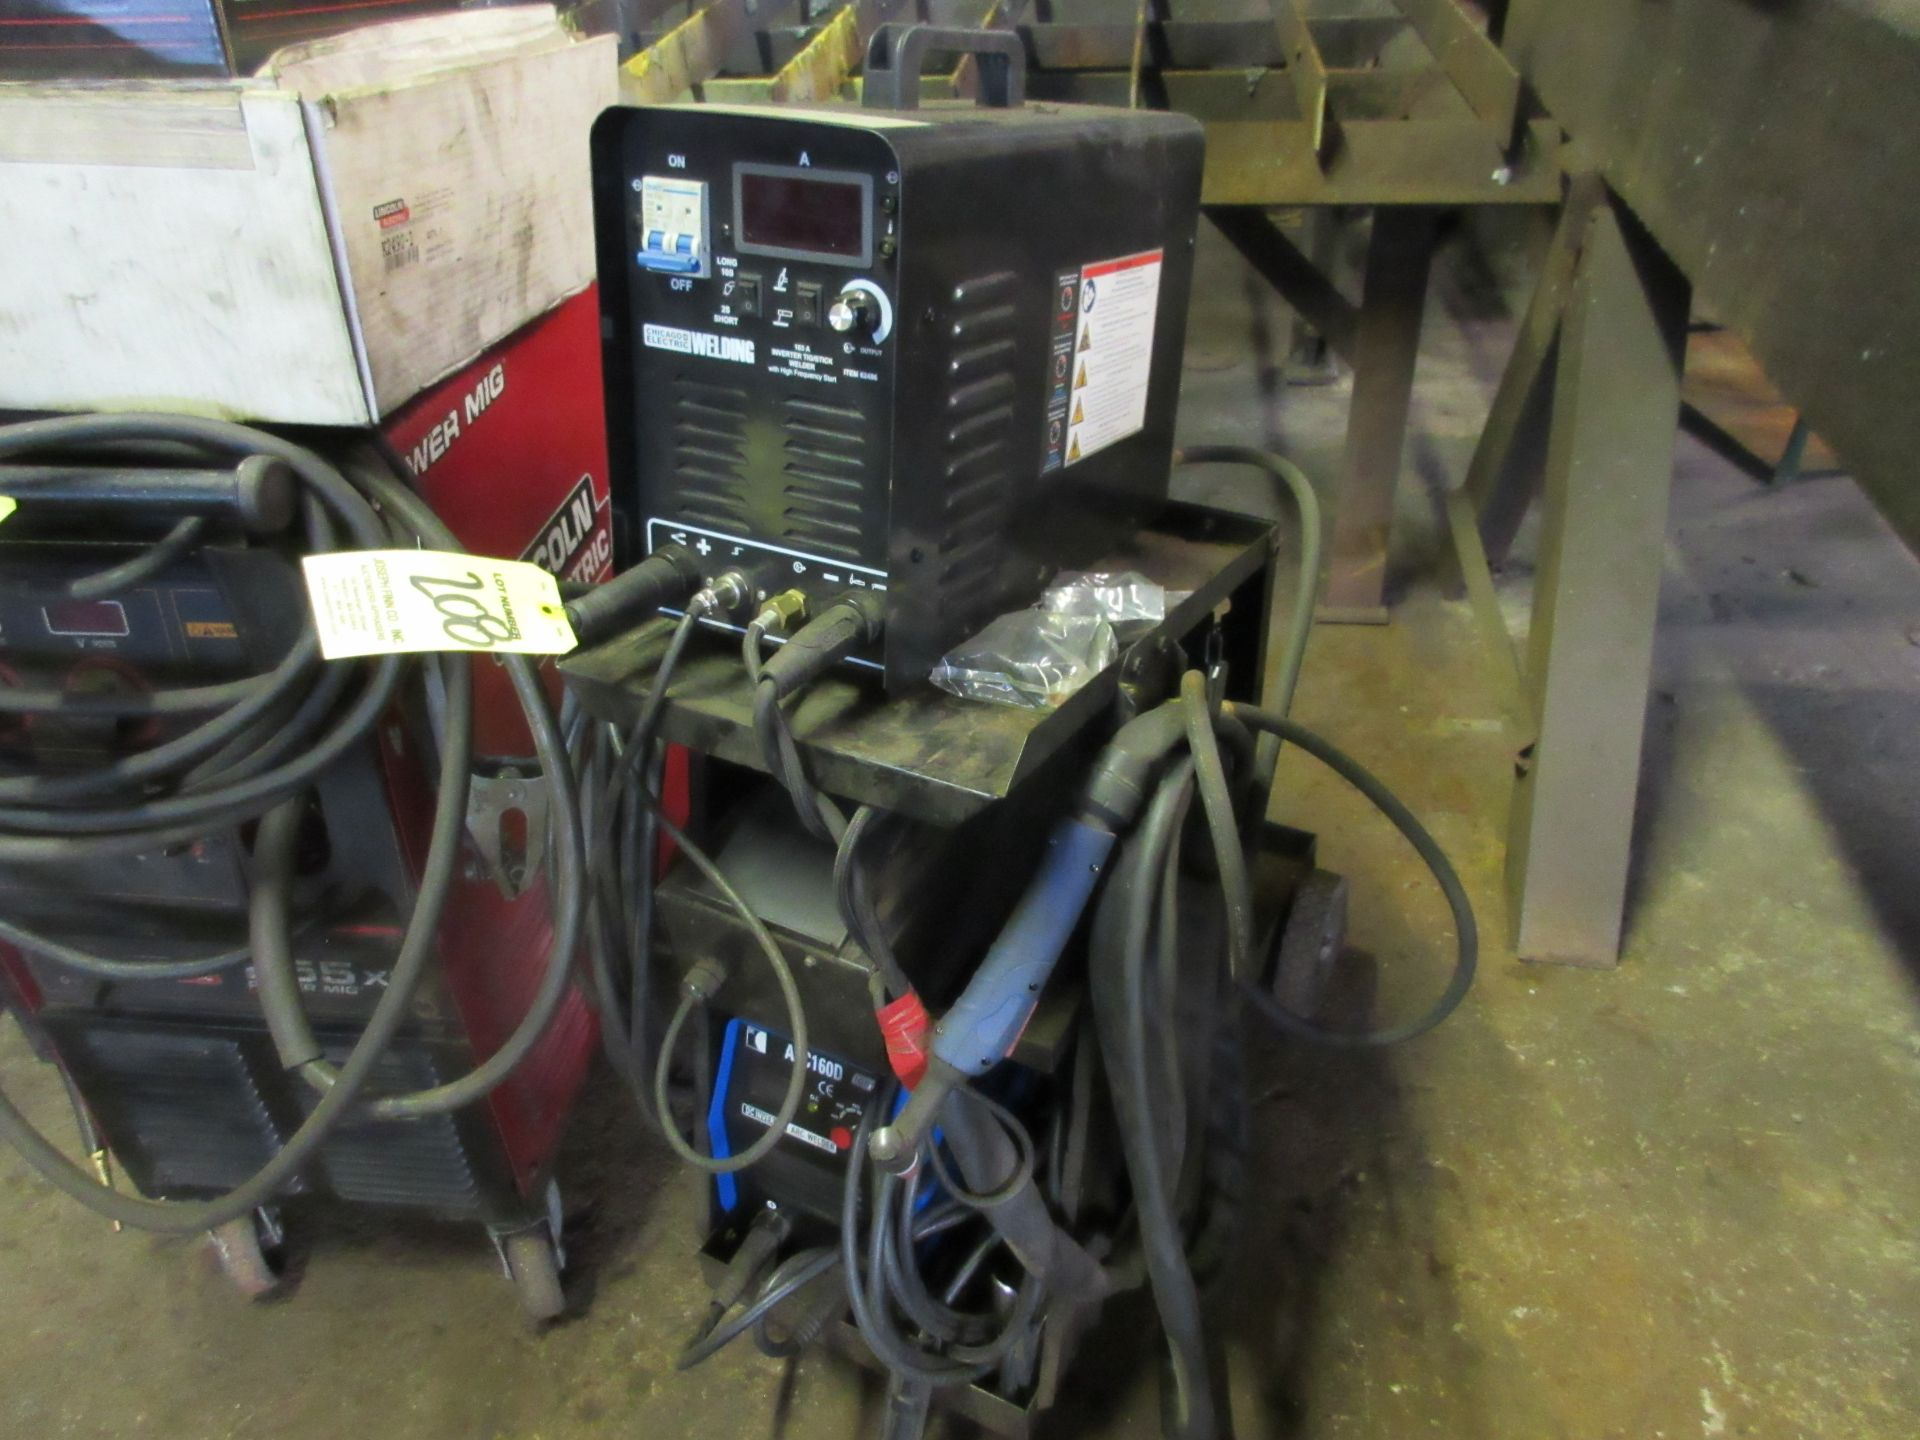 (1) IGBT Arc 160D Invertor Arc Welder w/ Chicago Electric Invertor Tig/Stick Welder, Foot Control - Image 5 of 5